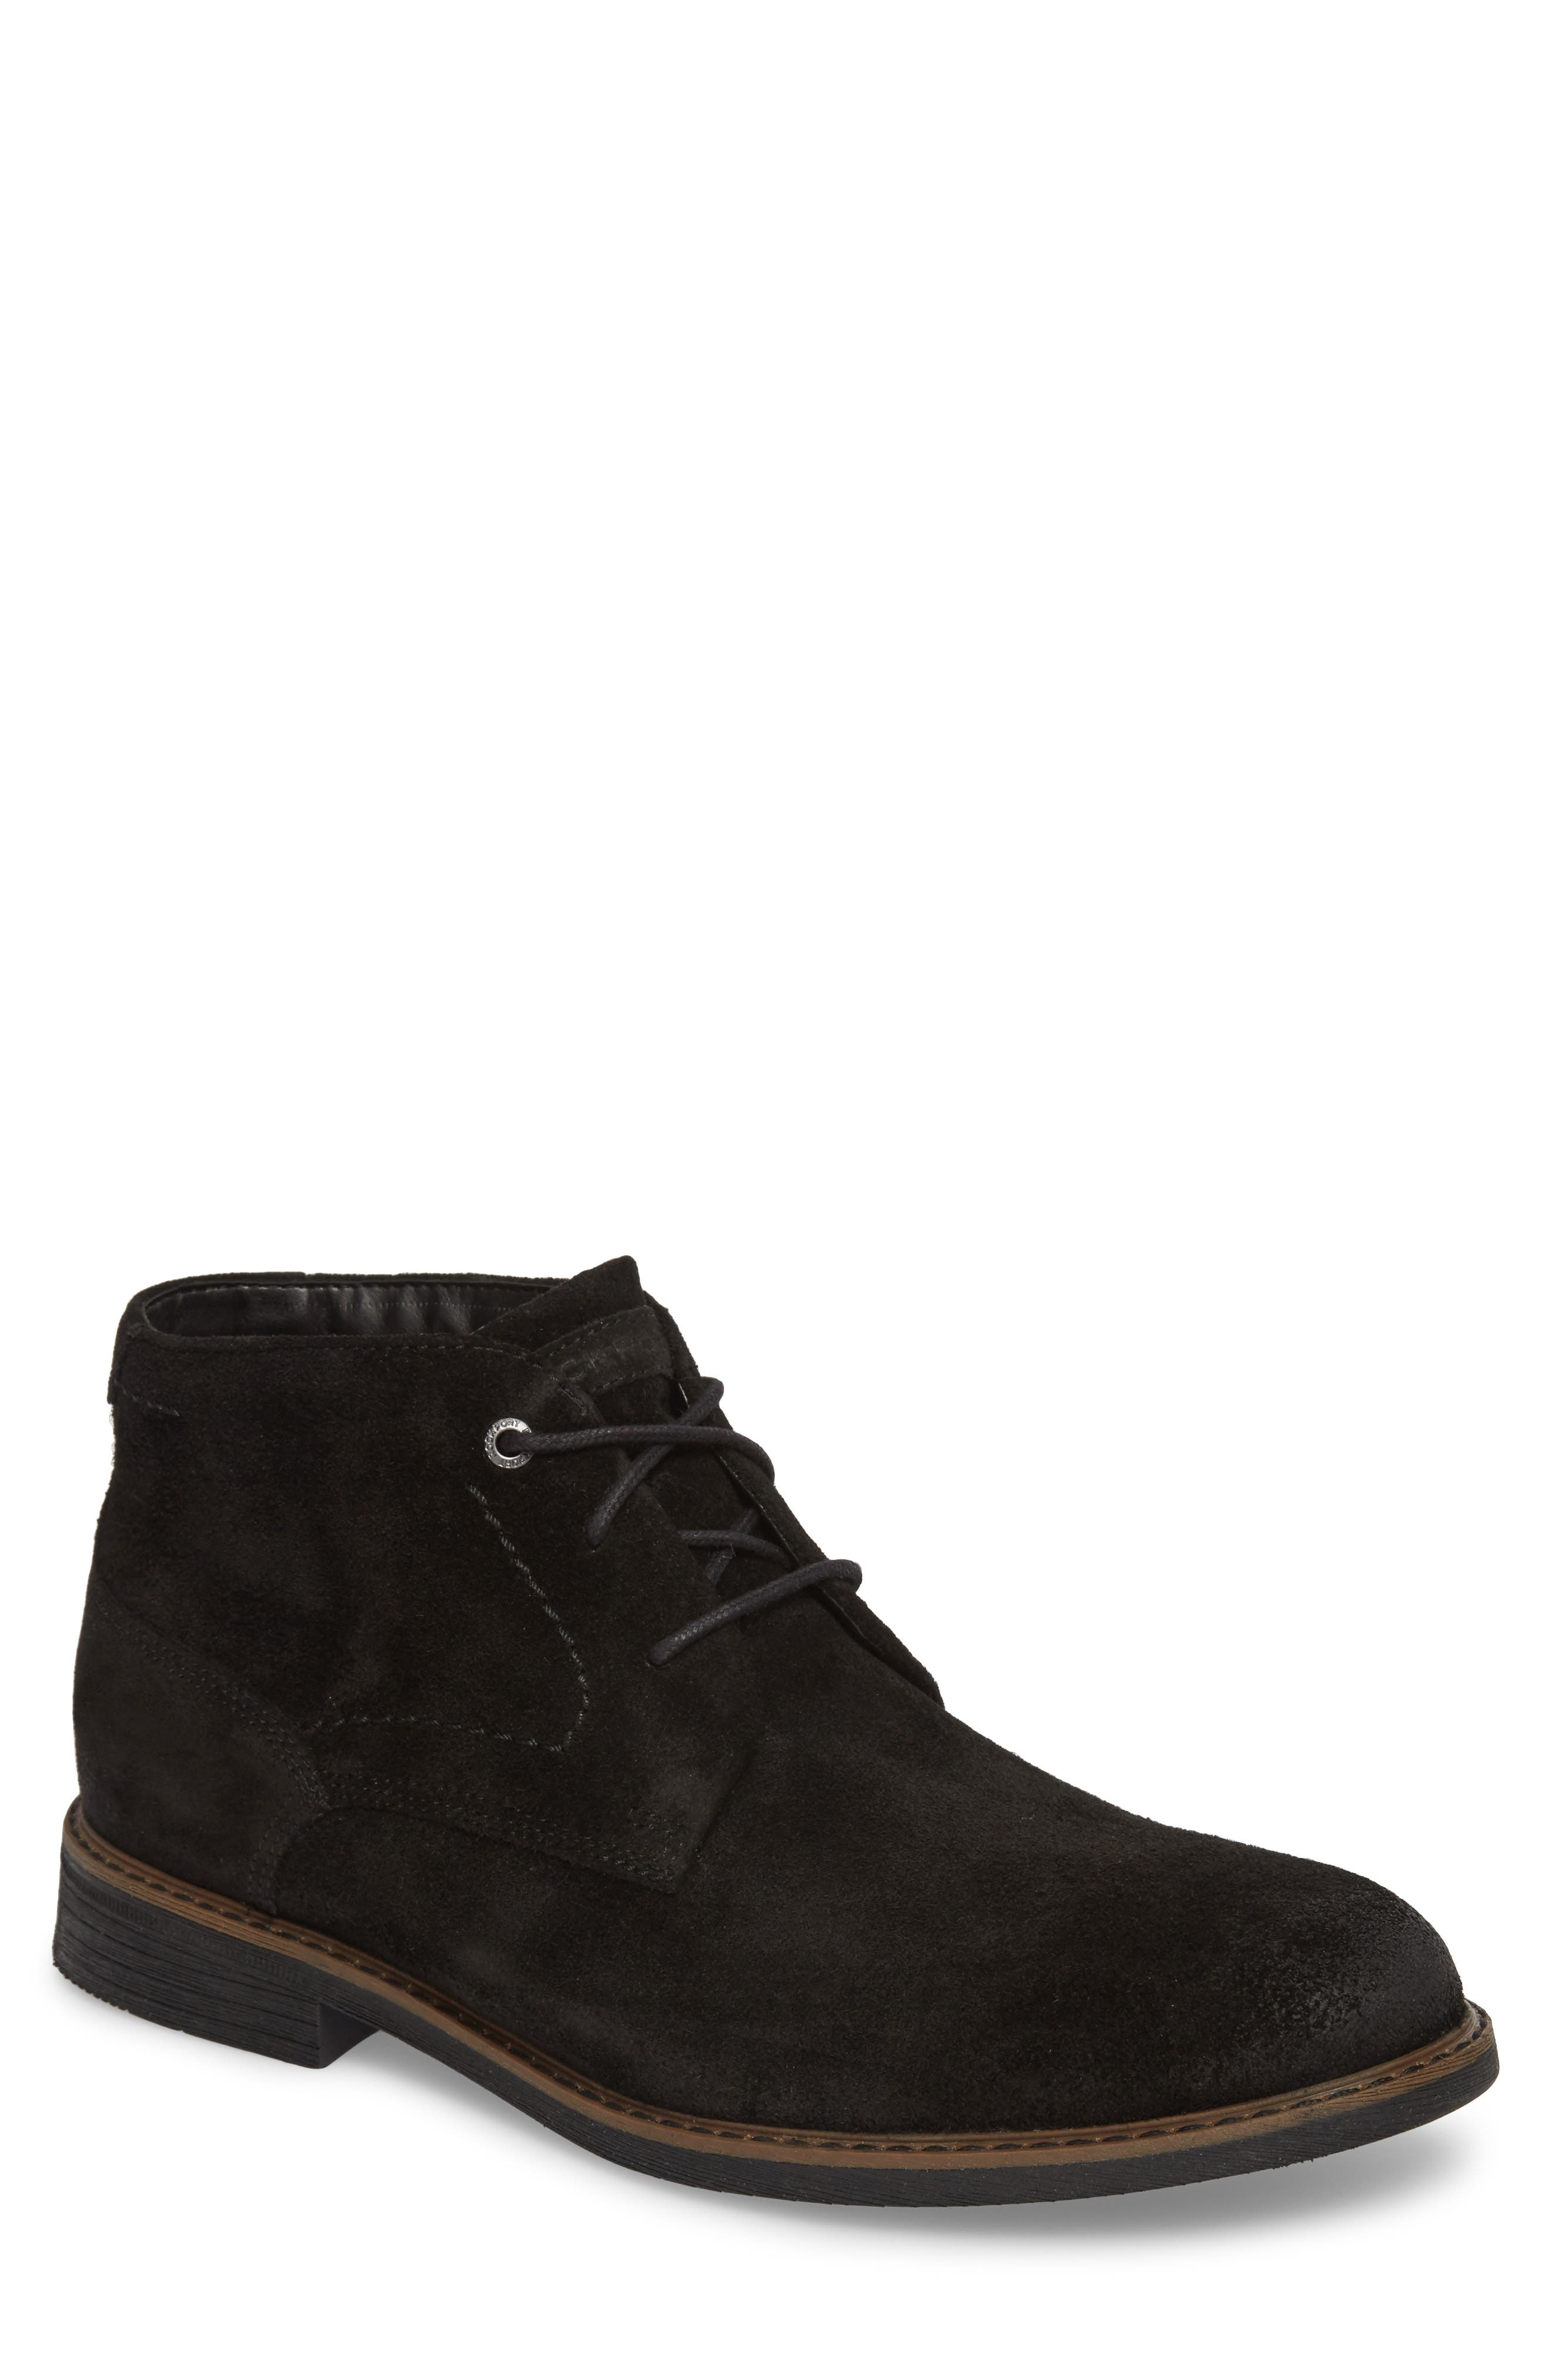 Classic Break Chukka Boot,                         Main,                         color, Black Suede